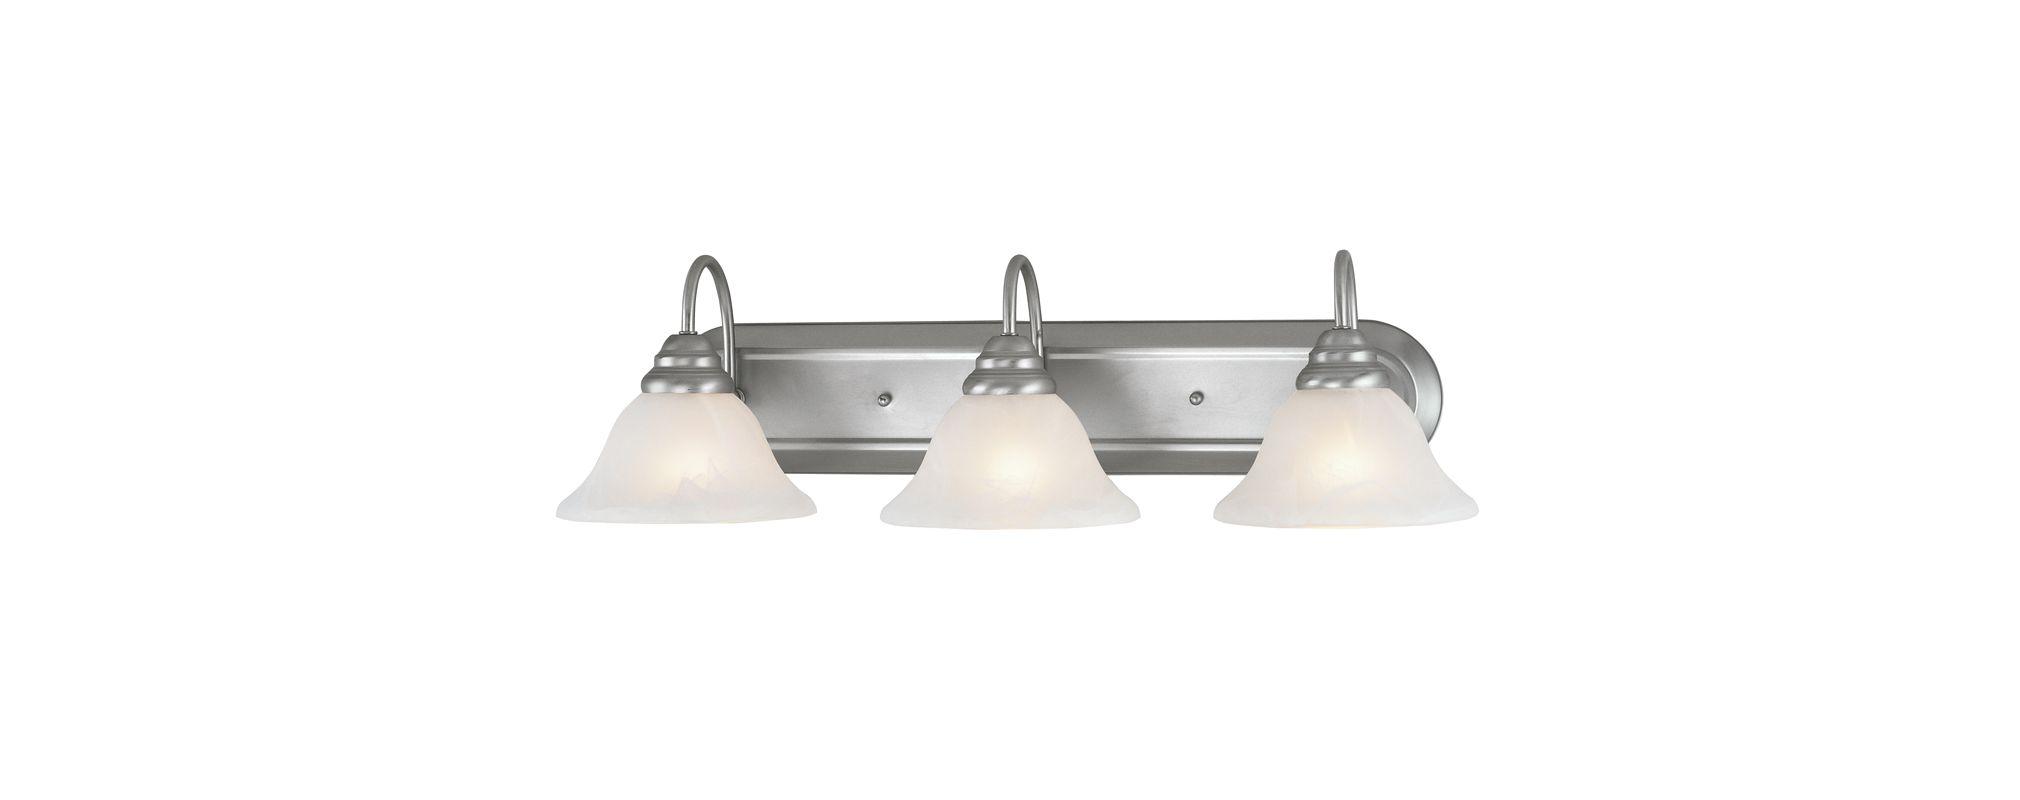 Livex Lighting 6113-91 Brushed Nickel Coronado 3 Light Bathroom Vanity Light - LightingDirect.com